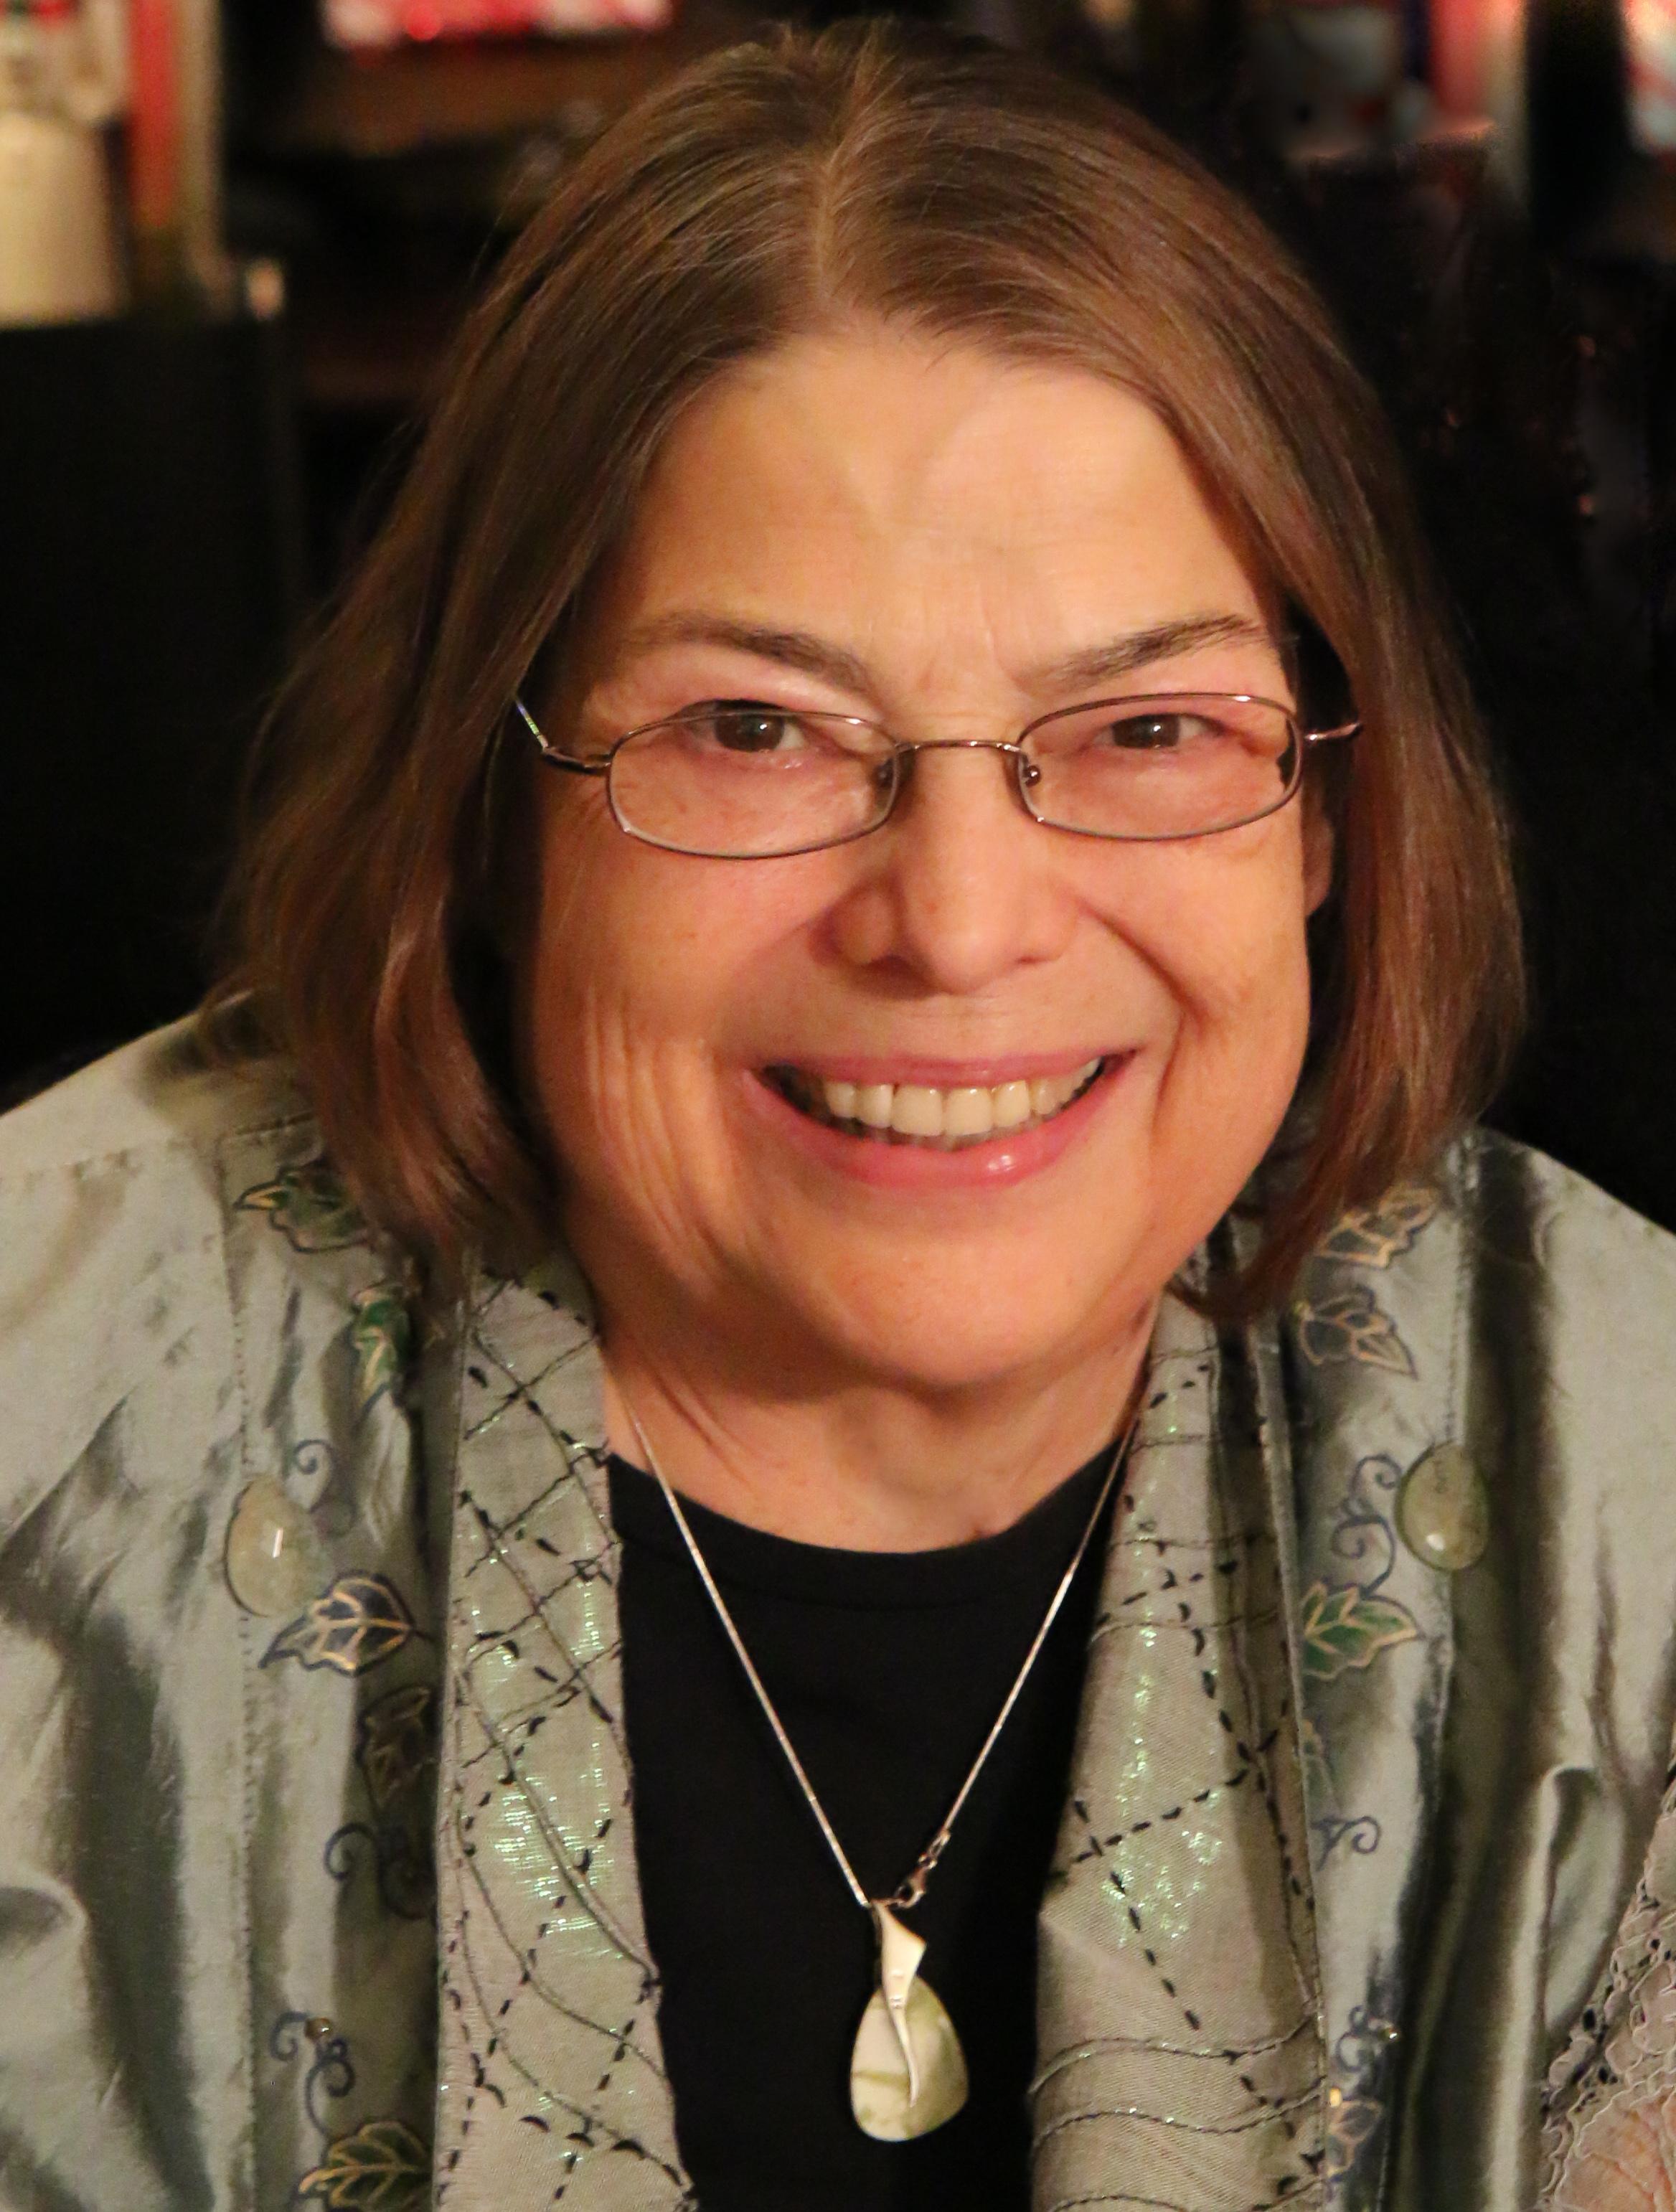 Carol Klimick Cyganowski